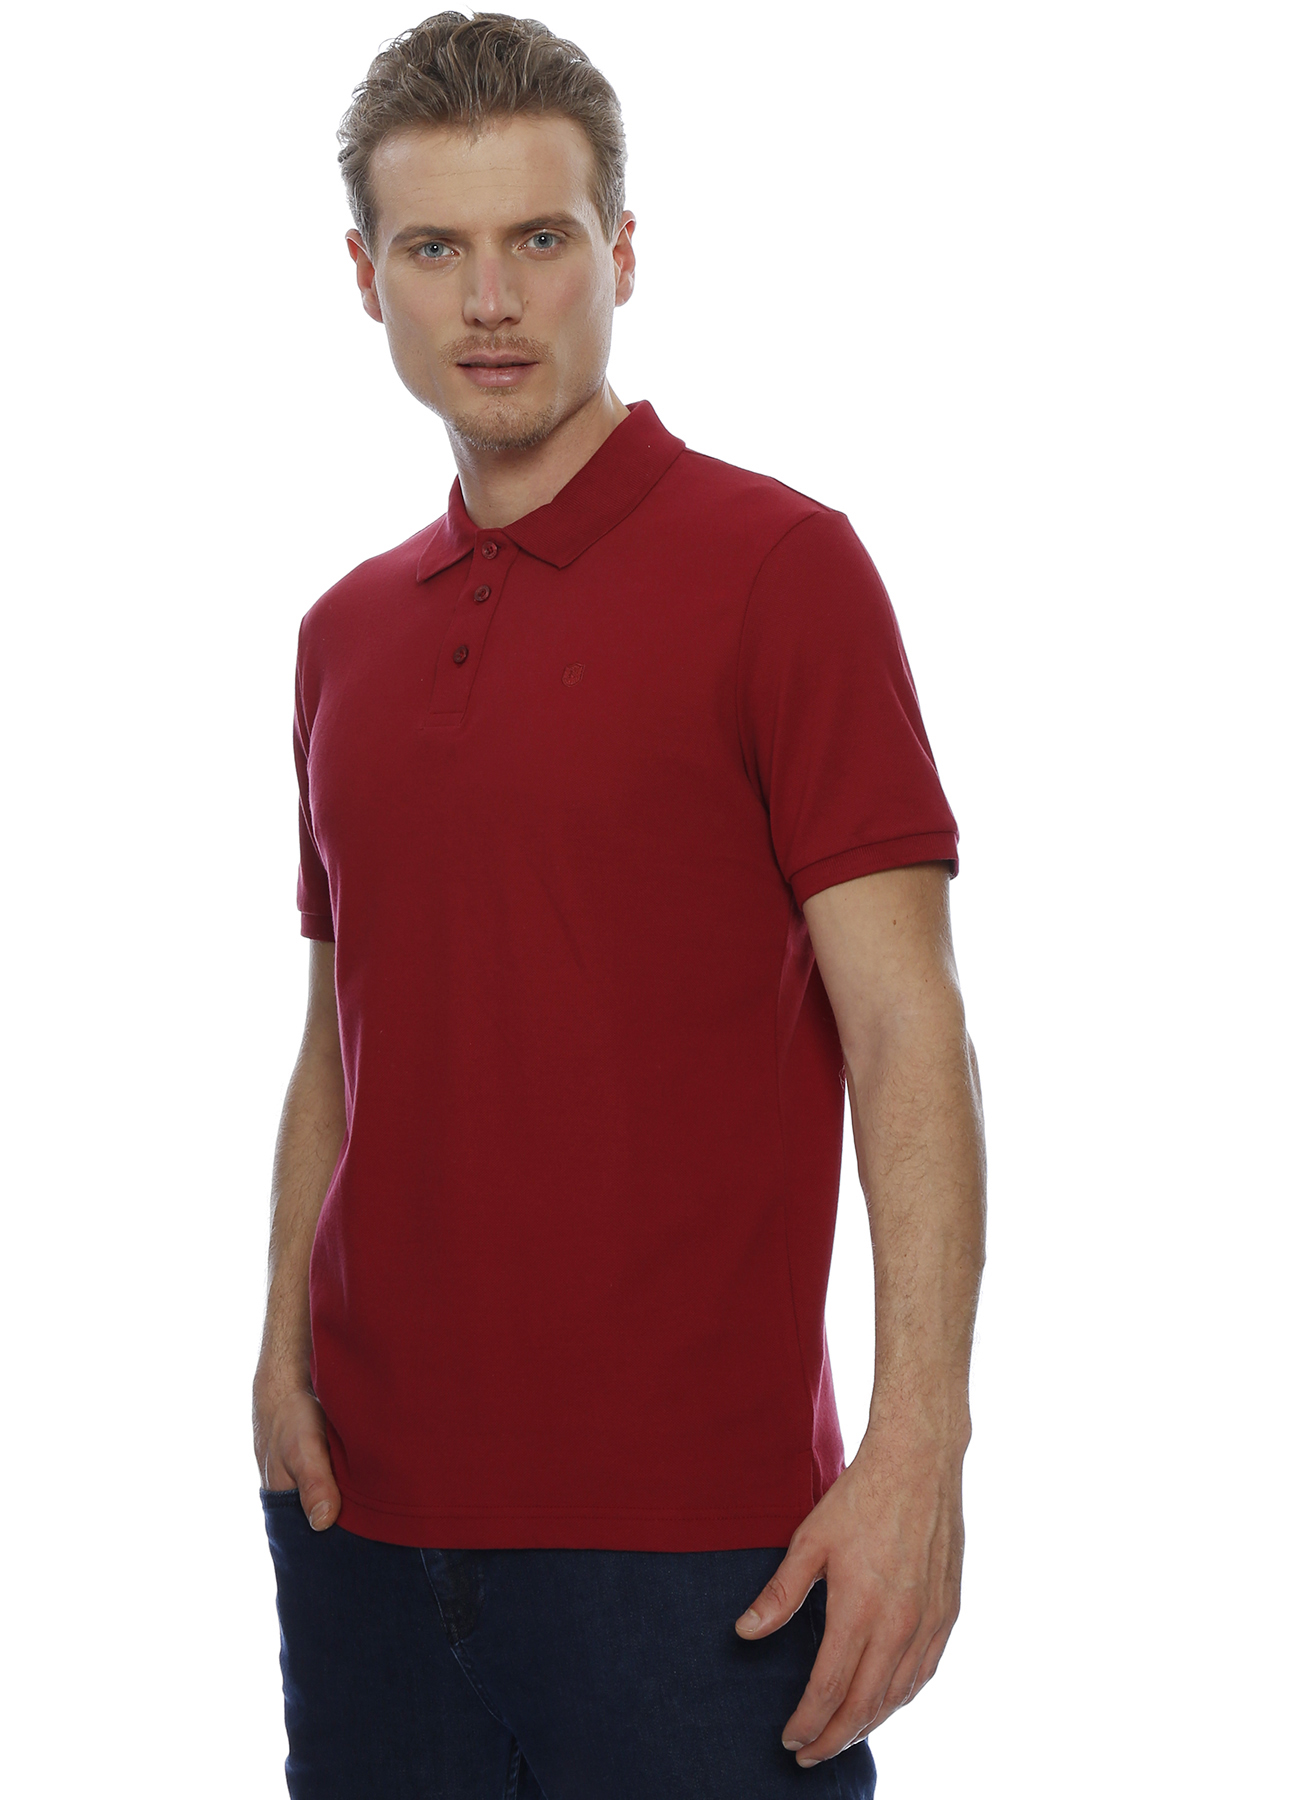 Limon Polo Yaka Kırmızı T-Shirt 2XL 5000186926005 Ürün Resmi